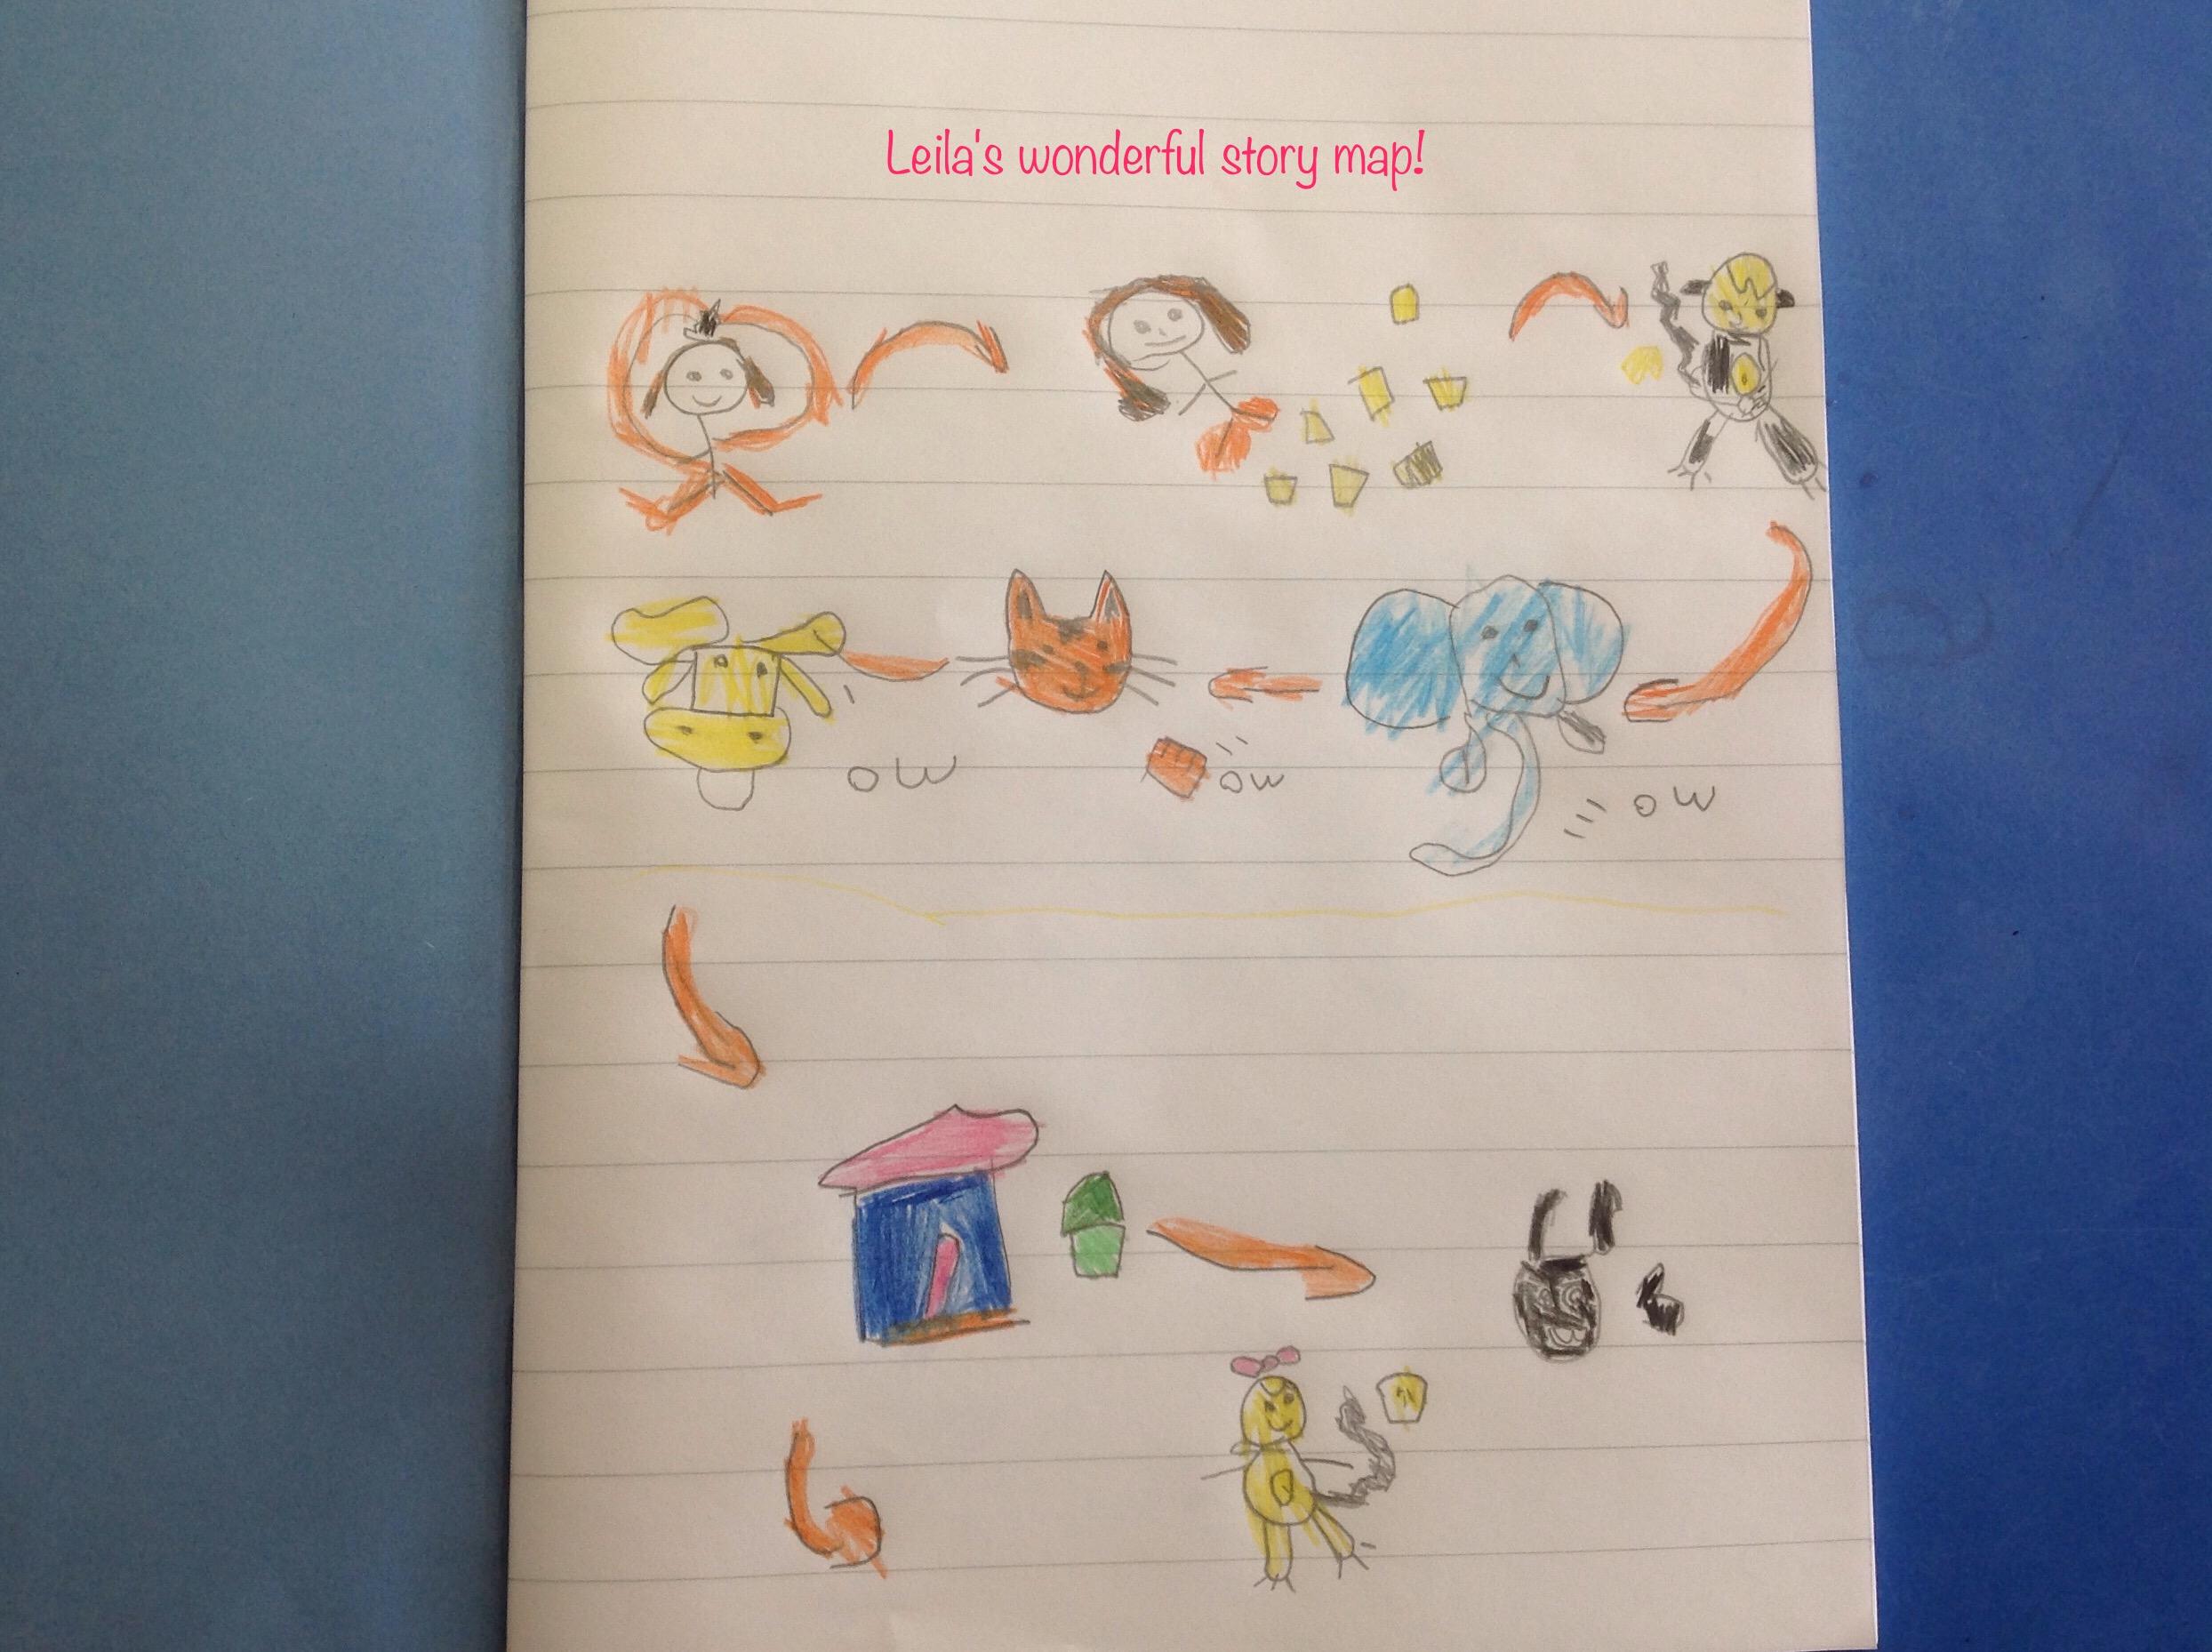 Leila's wonderful story map!